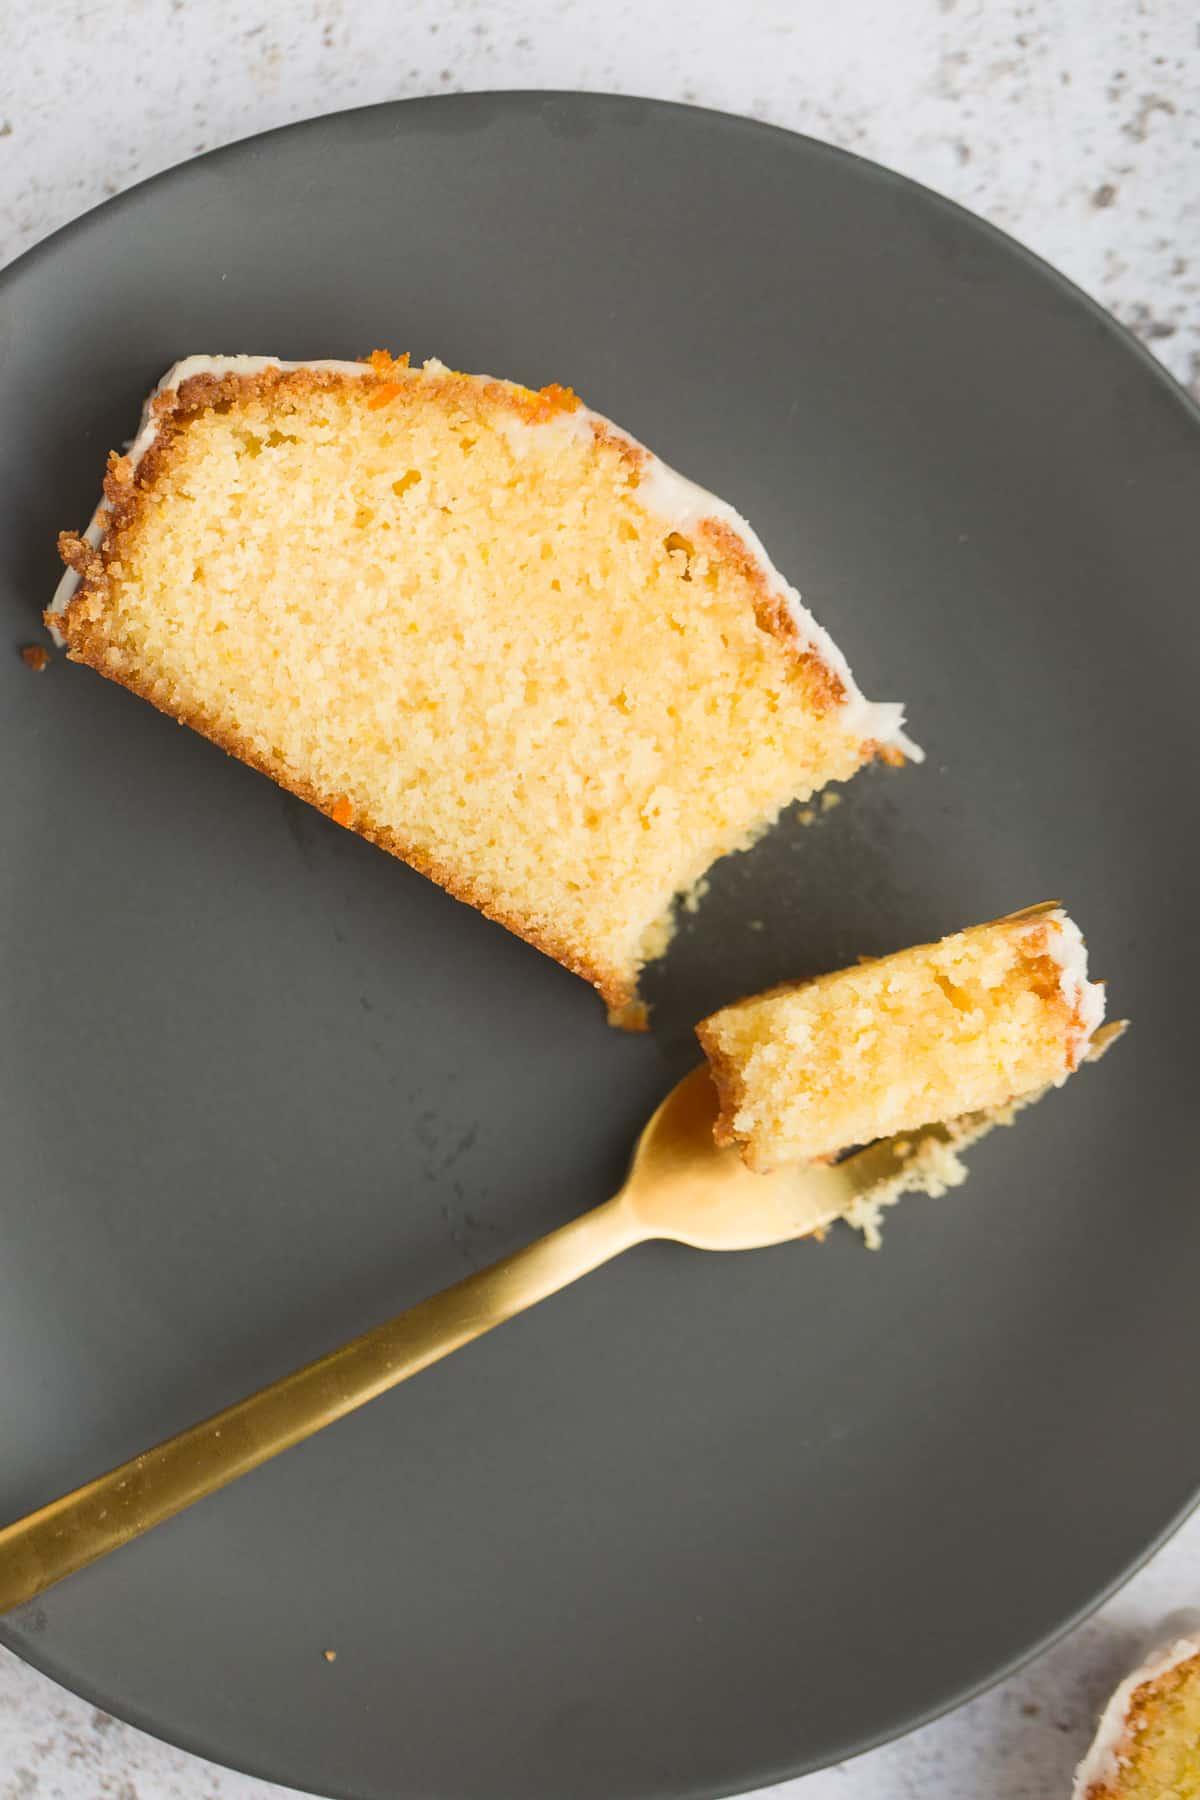 A slice of moist sponge cake on a small grey plate.